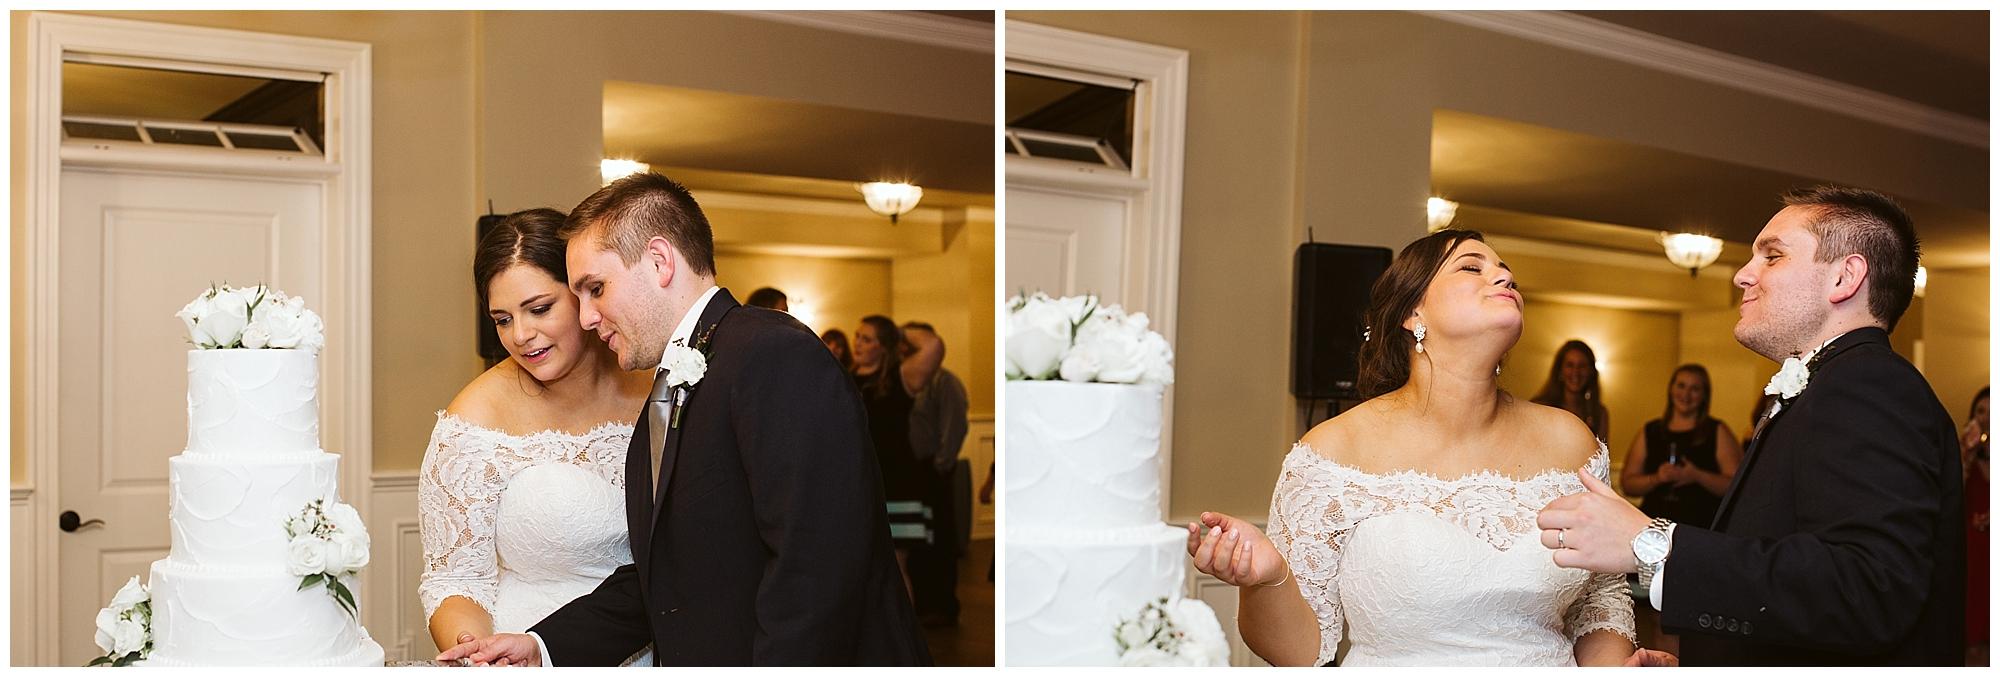 Oaks-at-salem-wedding-apex-photography-104.jpg